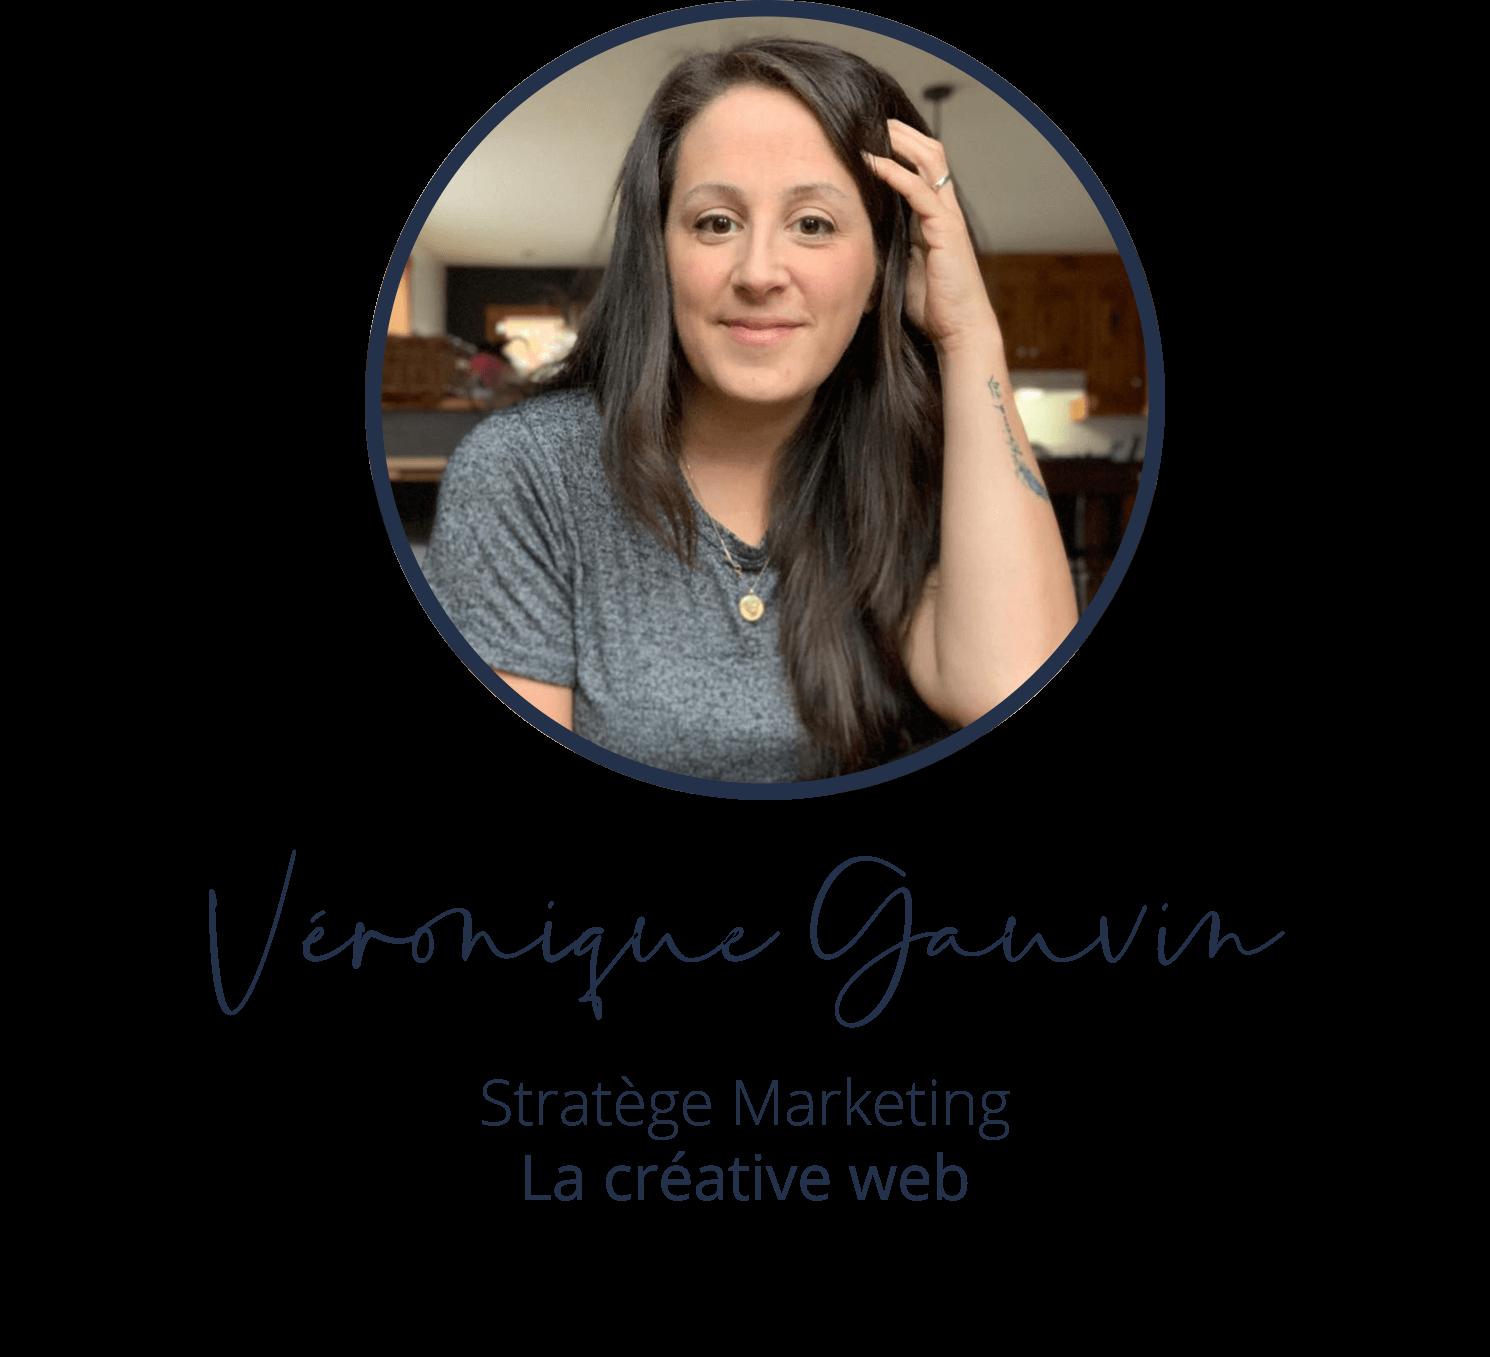 Véronique Gauvin, Stratège Marketing, La créative web